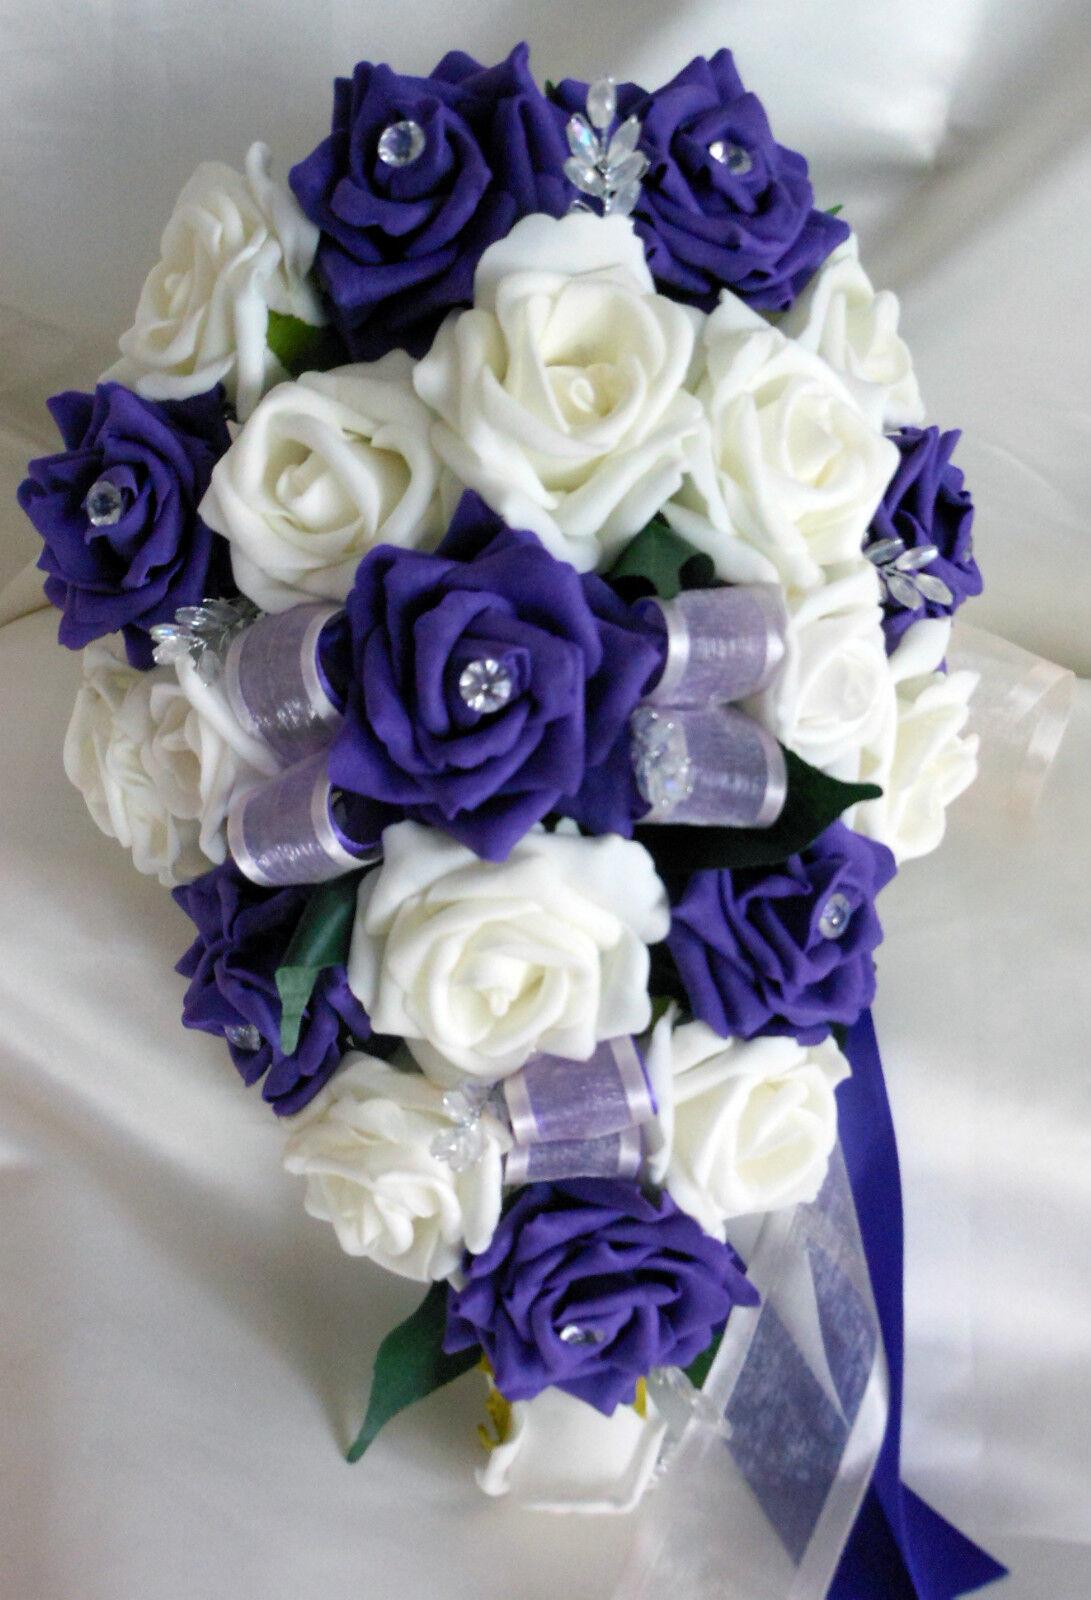 Brides Teardrop Bouquet, wedding FIORI FIORI FIORI Avorio & viola rosas con diamante e7c1bc